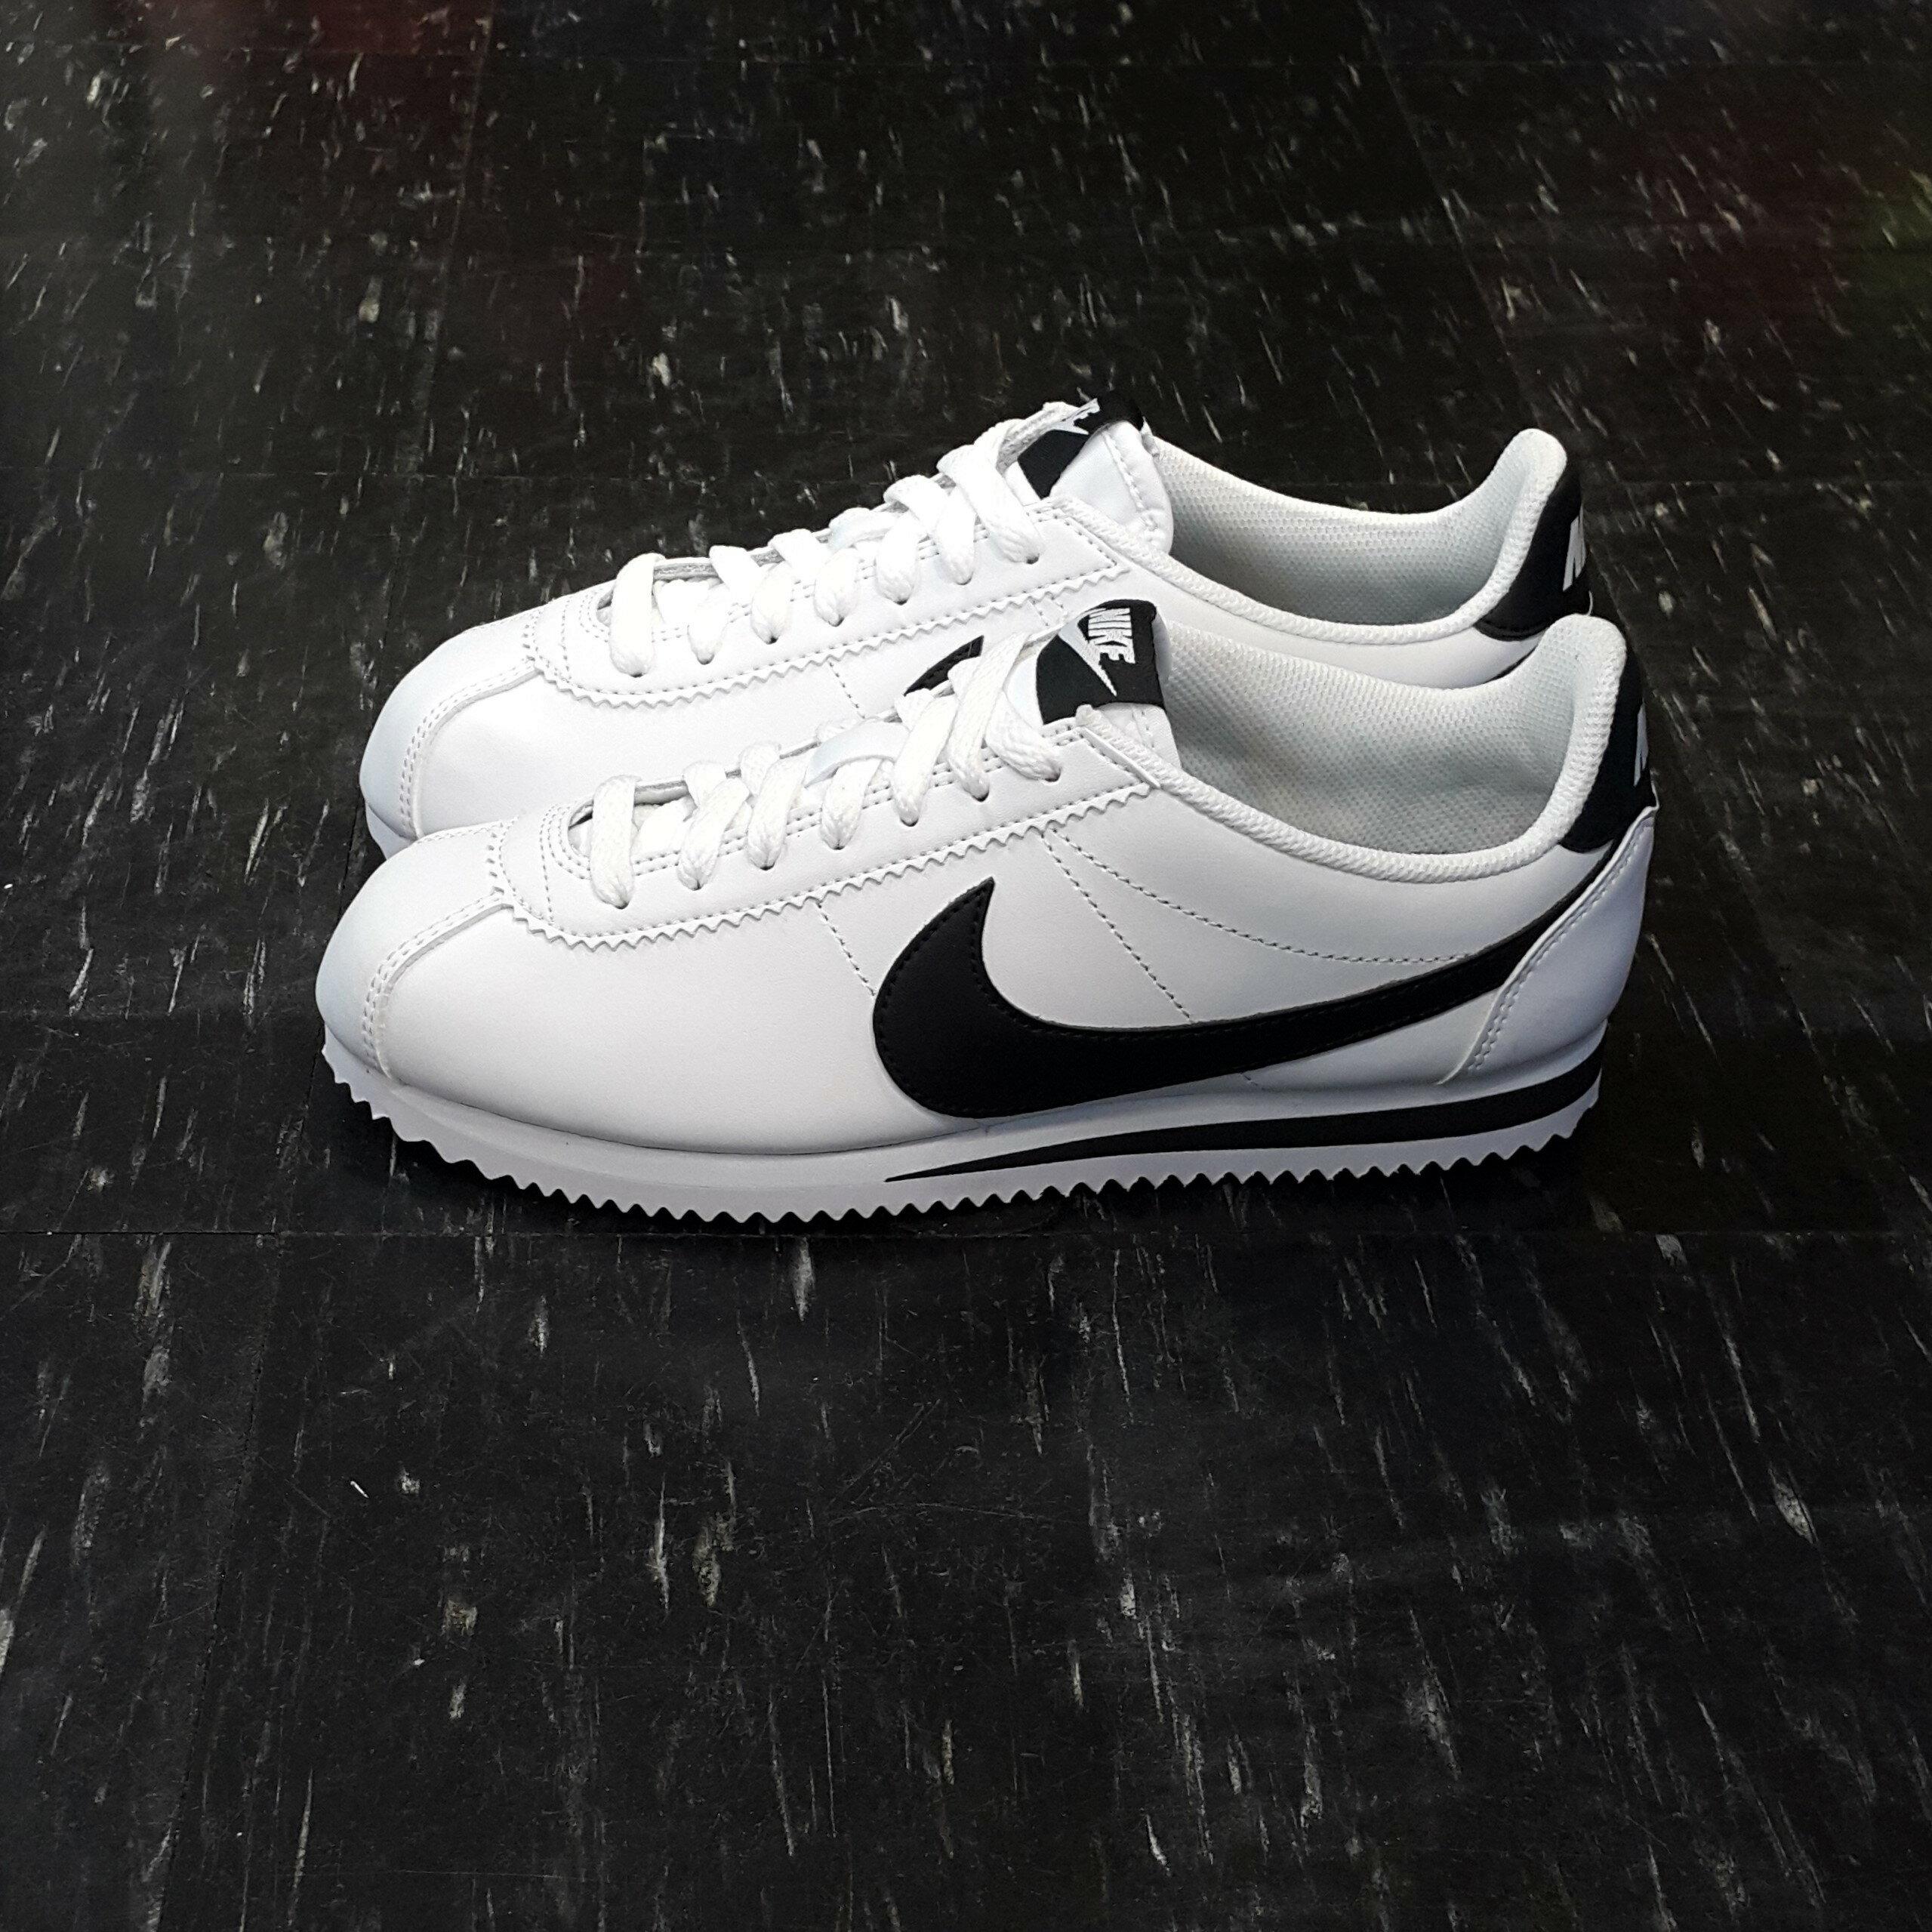 NIKE WMNS CLASSIC CORTEZ LEATHER 阿甘鞋 白色 黑色 黑勾 白黑 皮革 經典 807471-101